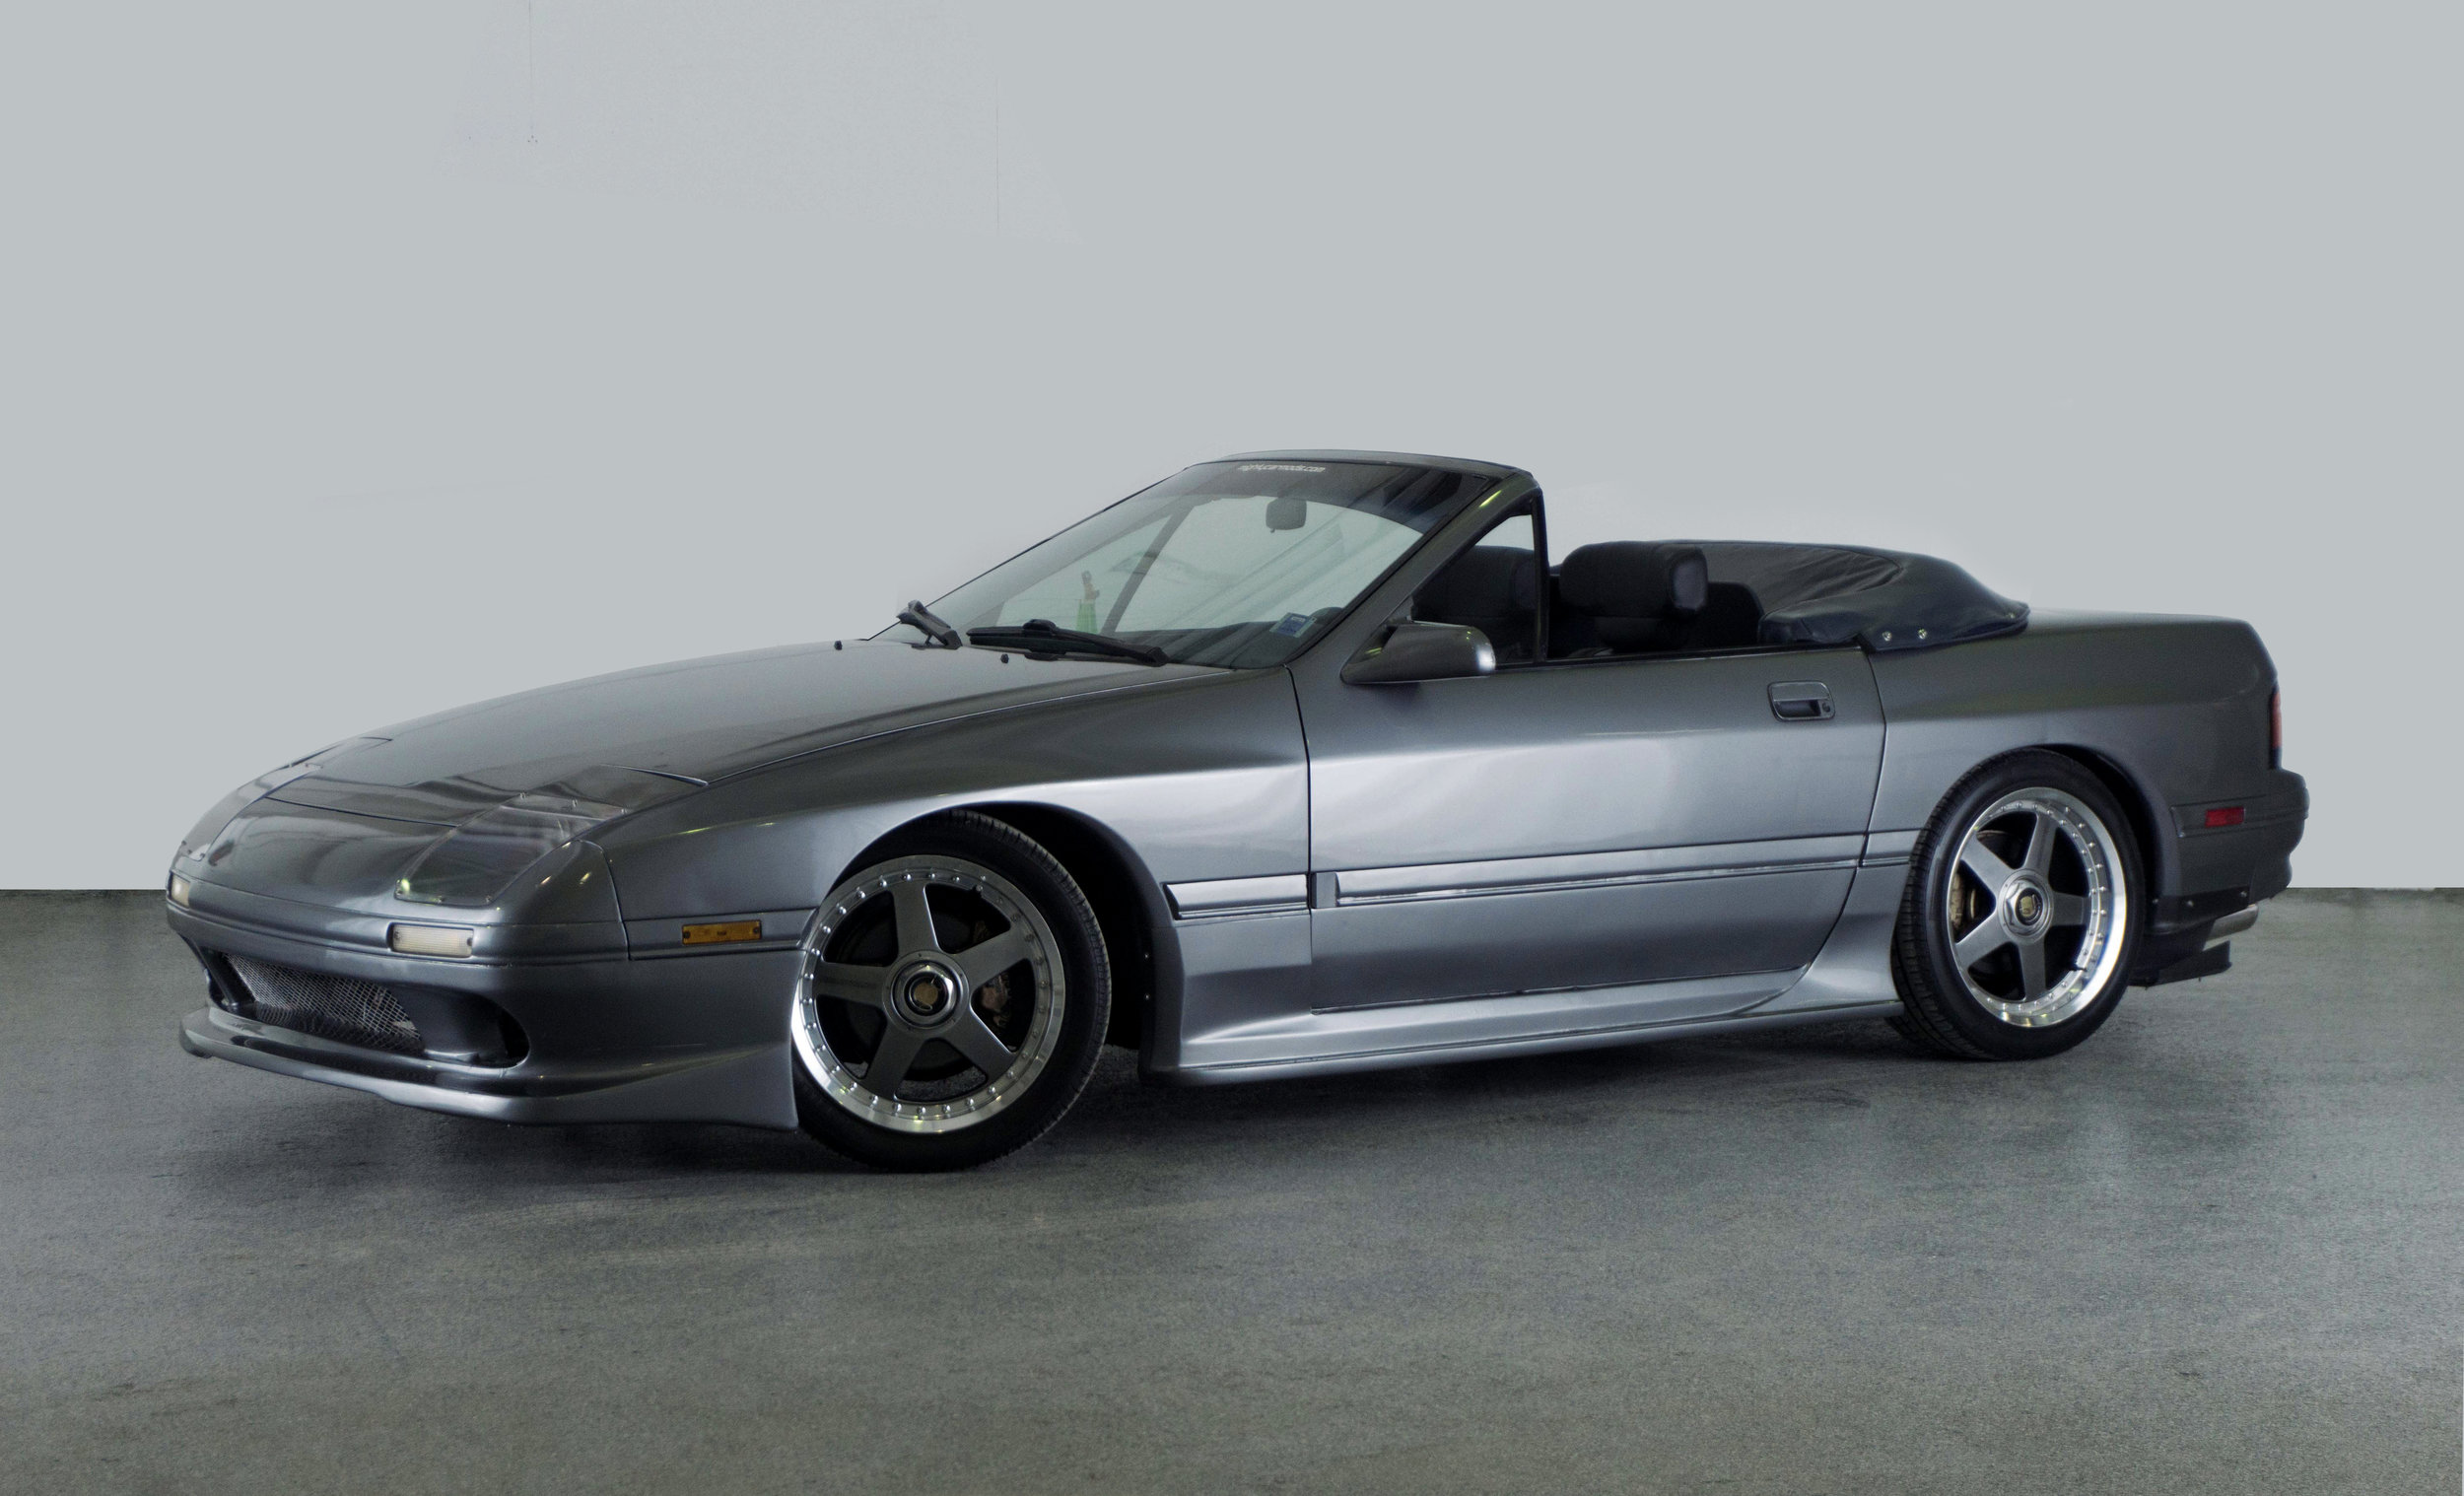 1988_Mazda_RX7_Convertible.jpg